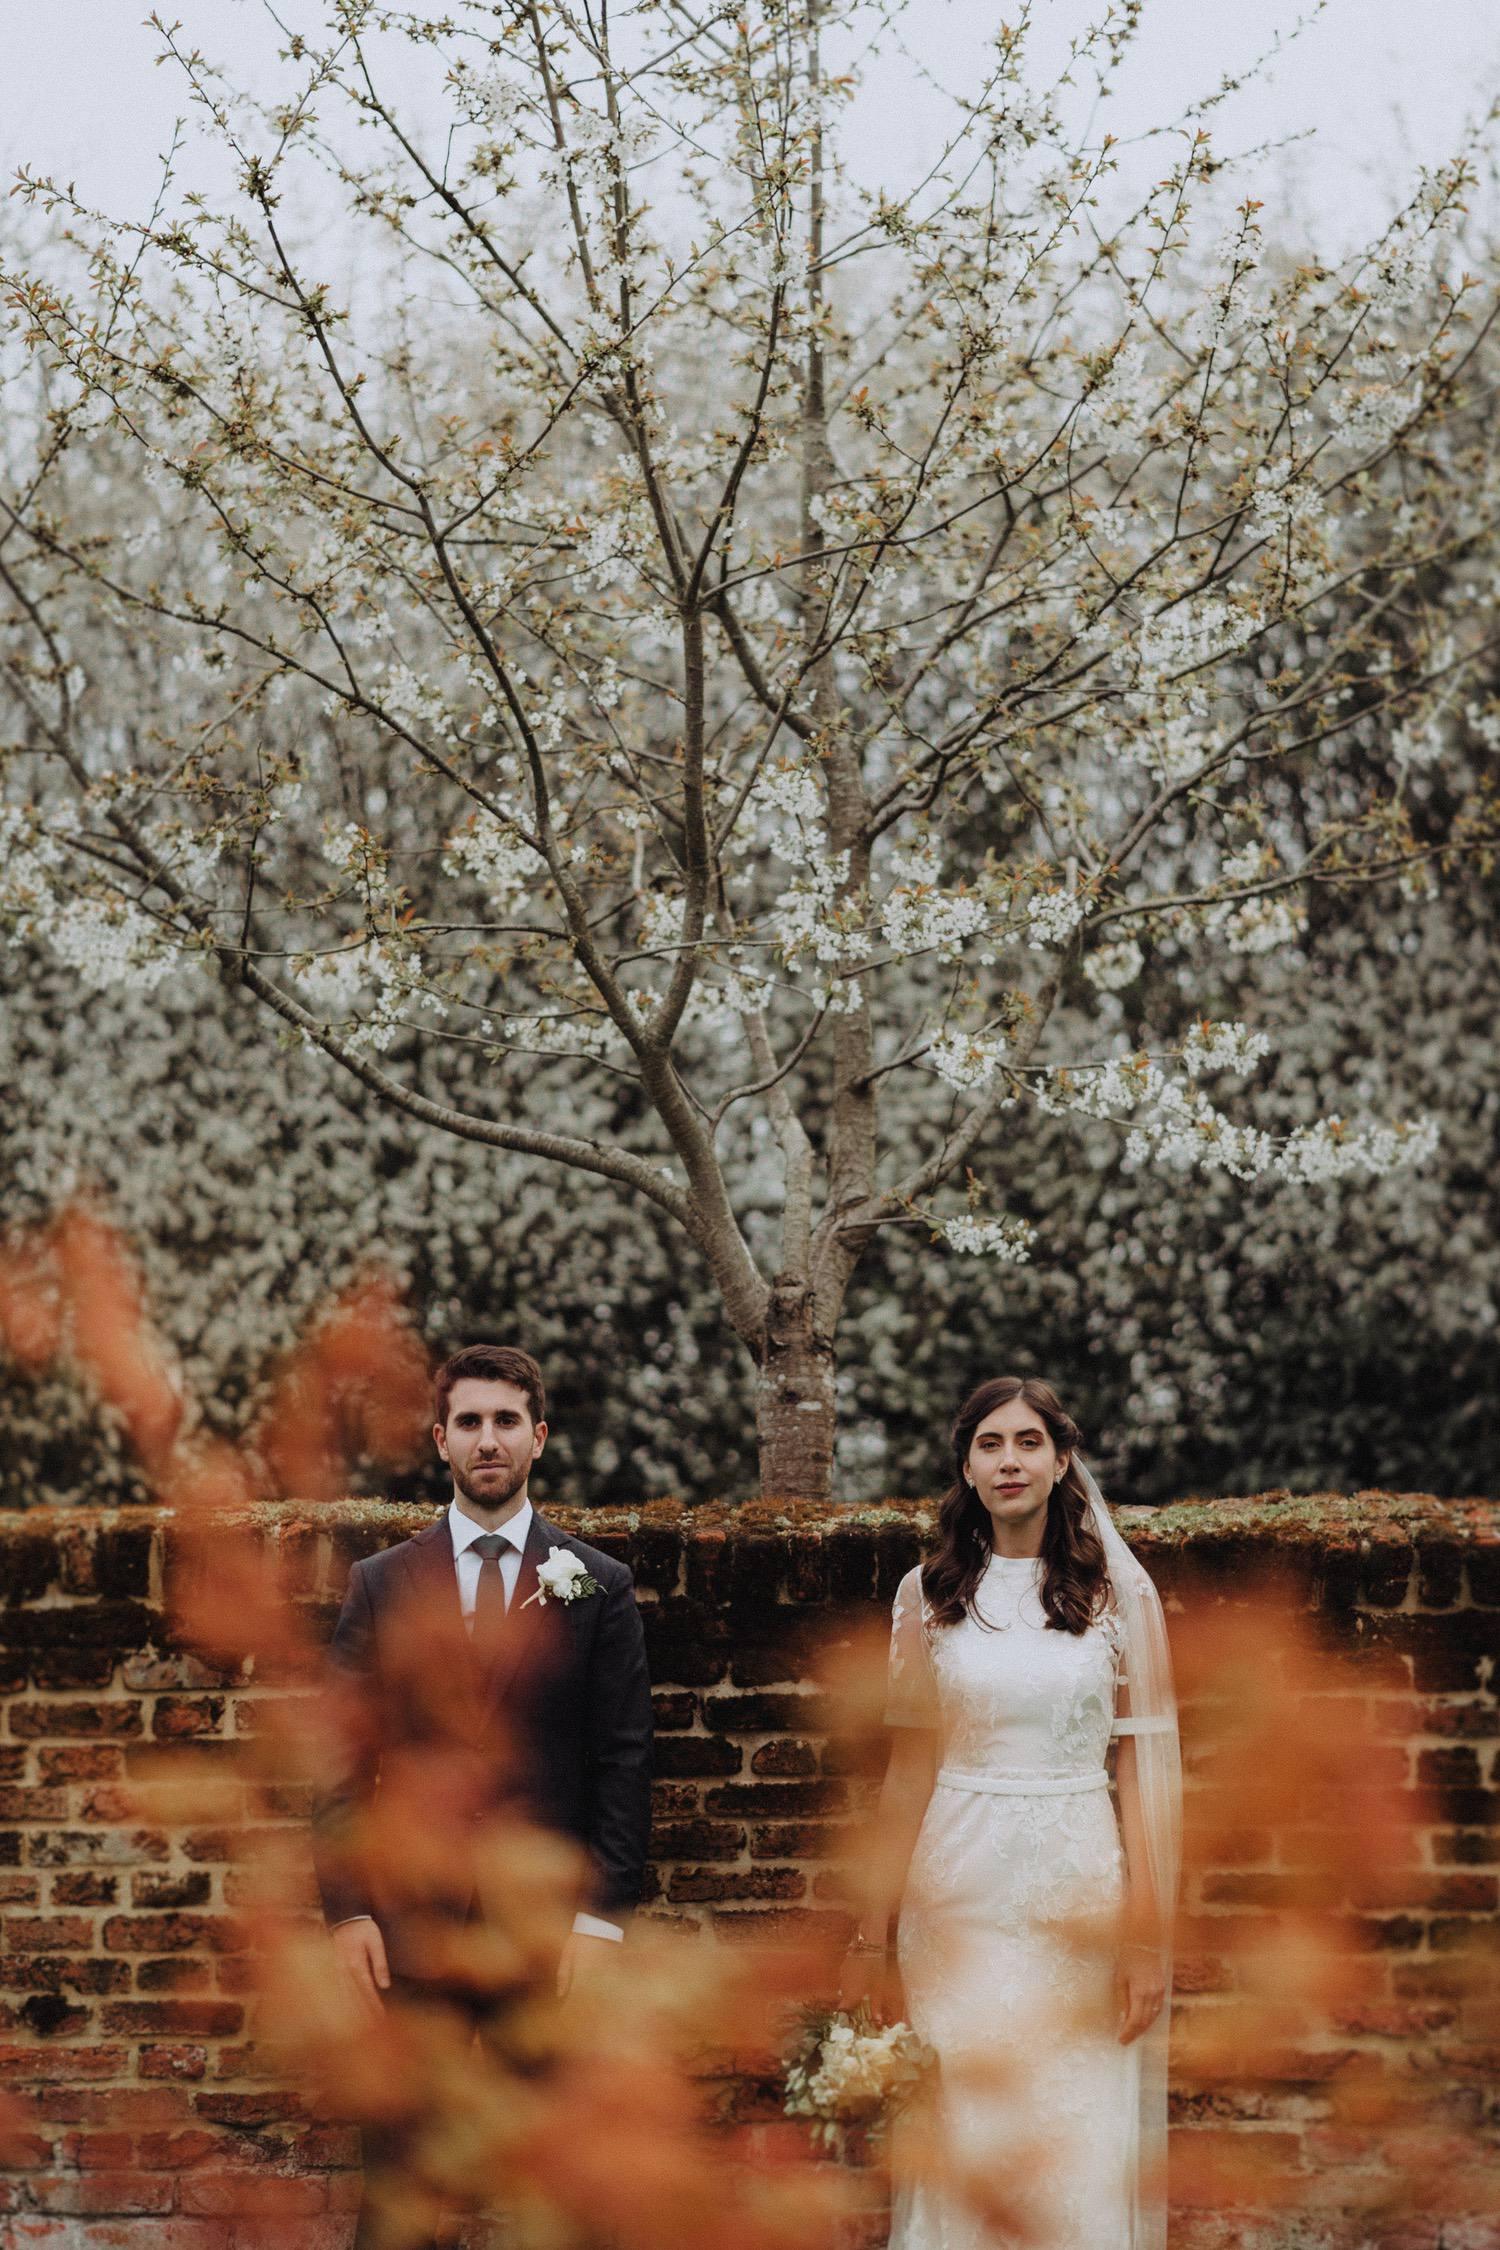 Leez-Priory-Wedding-Photographer-Paul-Liddement-76.jpg